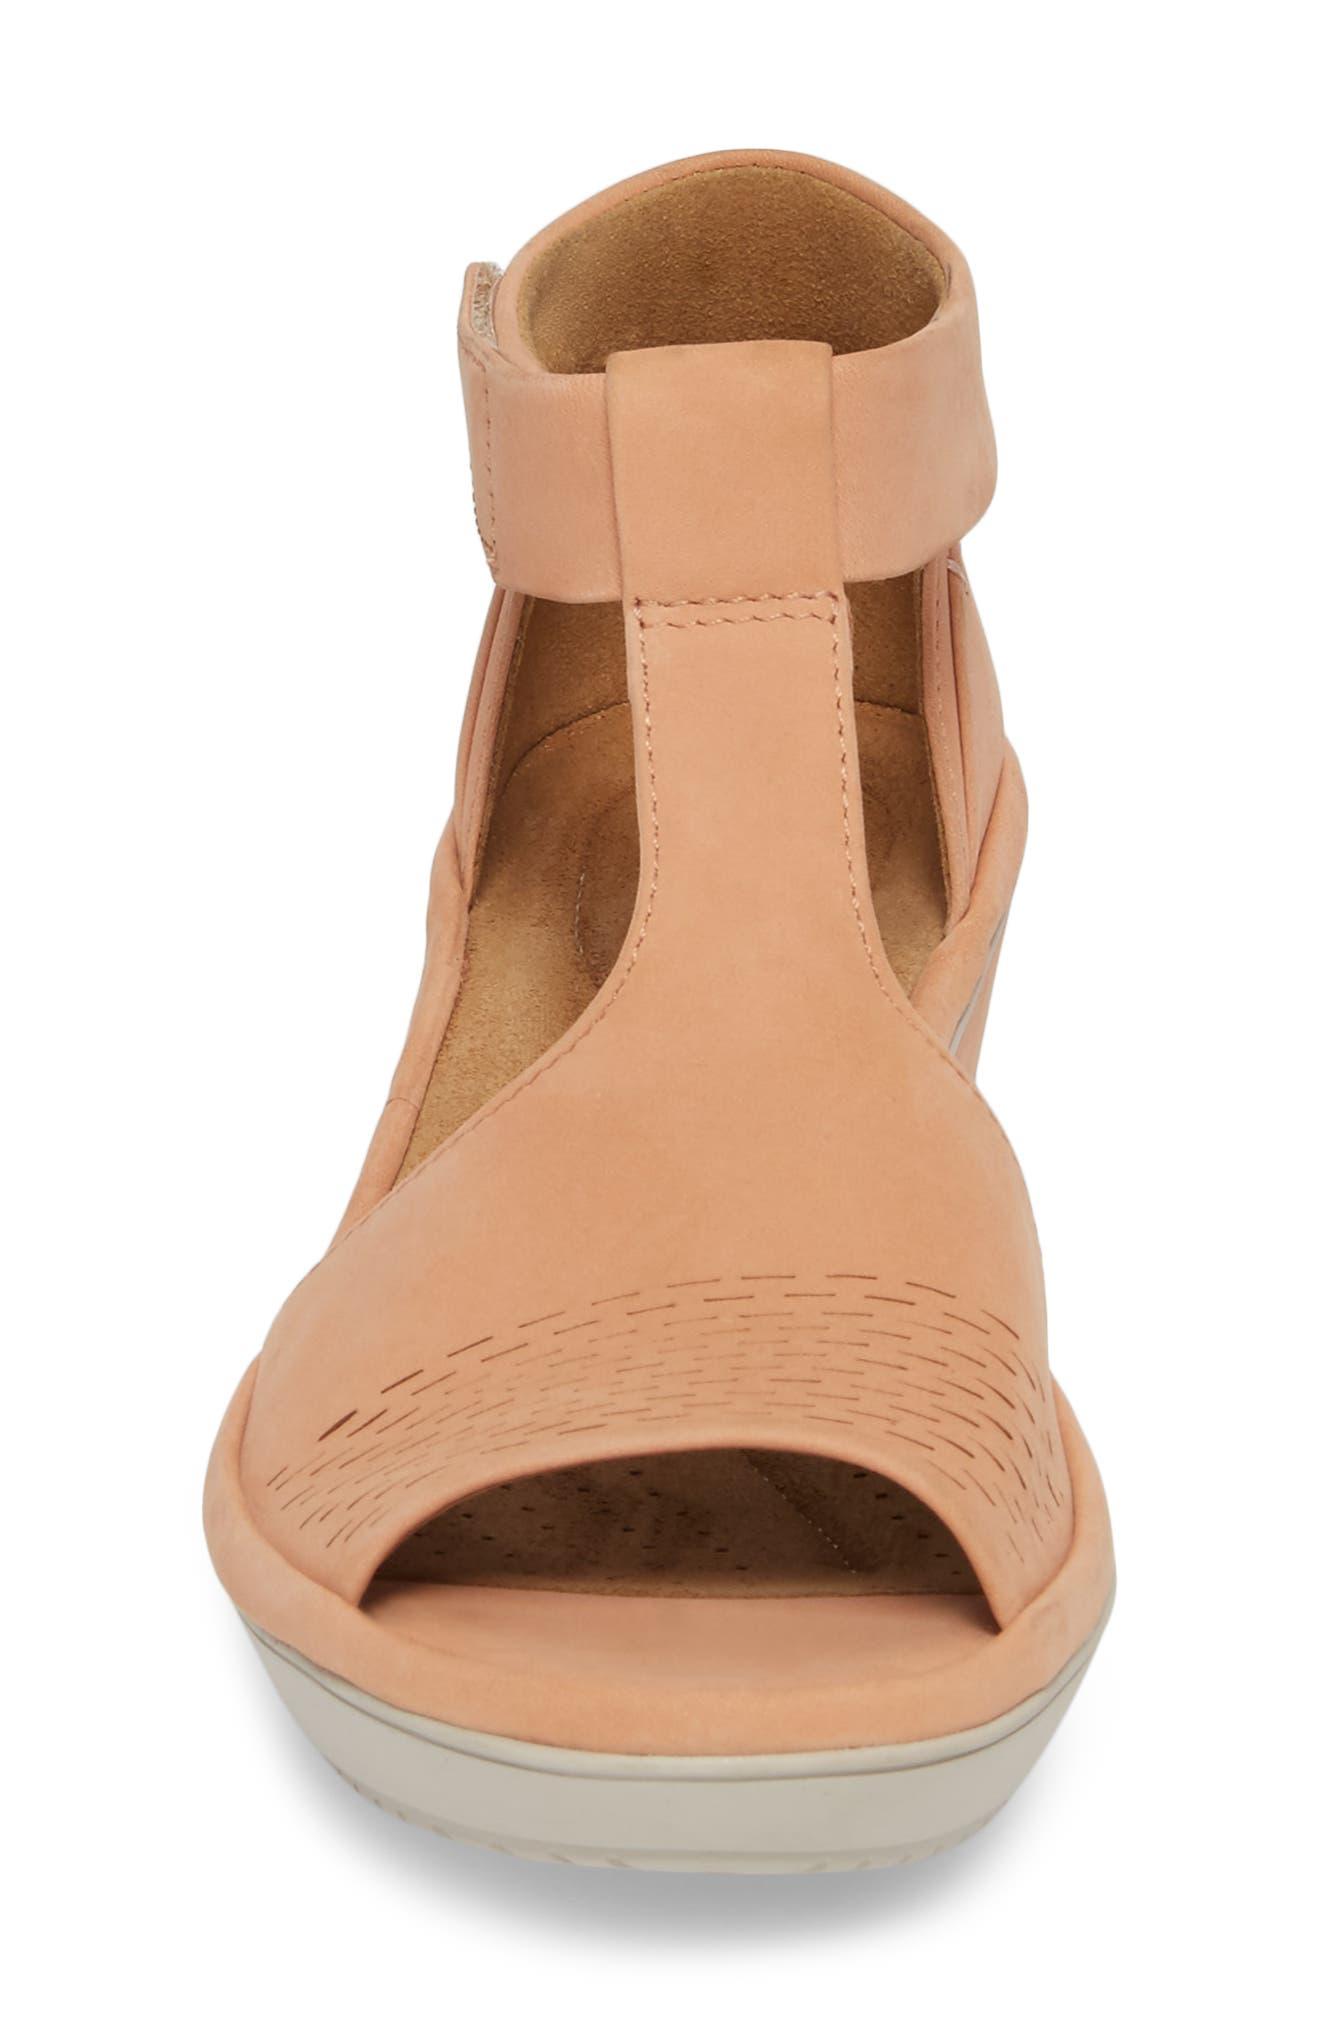 Wynnmere Avah T-Strap Wedge Sandal,                             Alternate thumbnail 4, color,                             Peach Nubuck